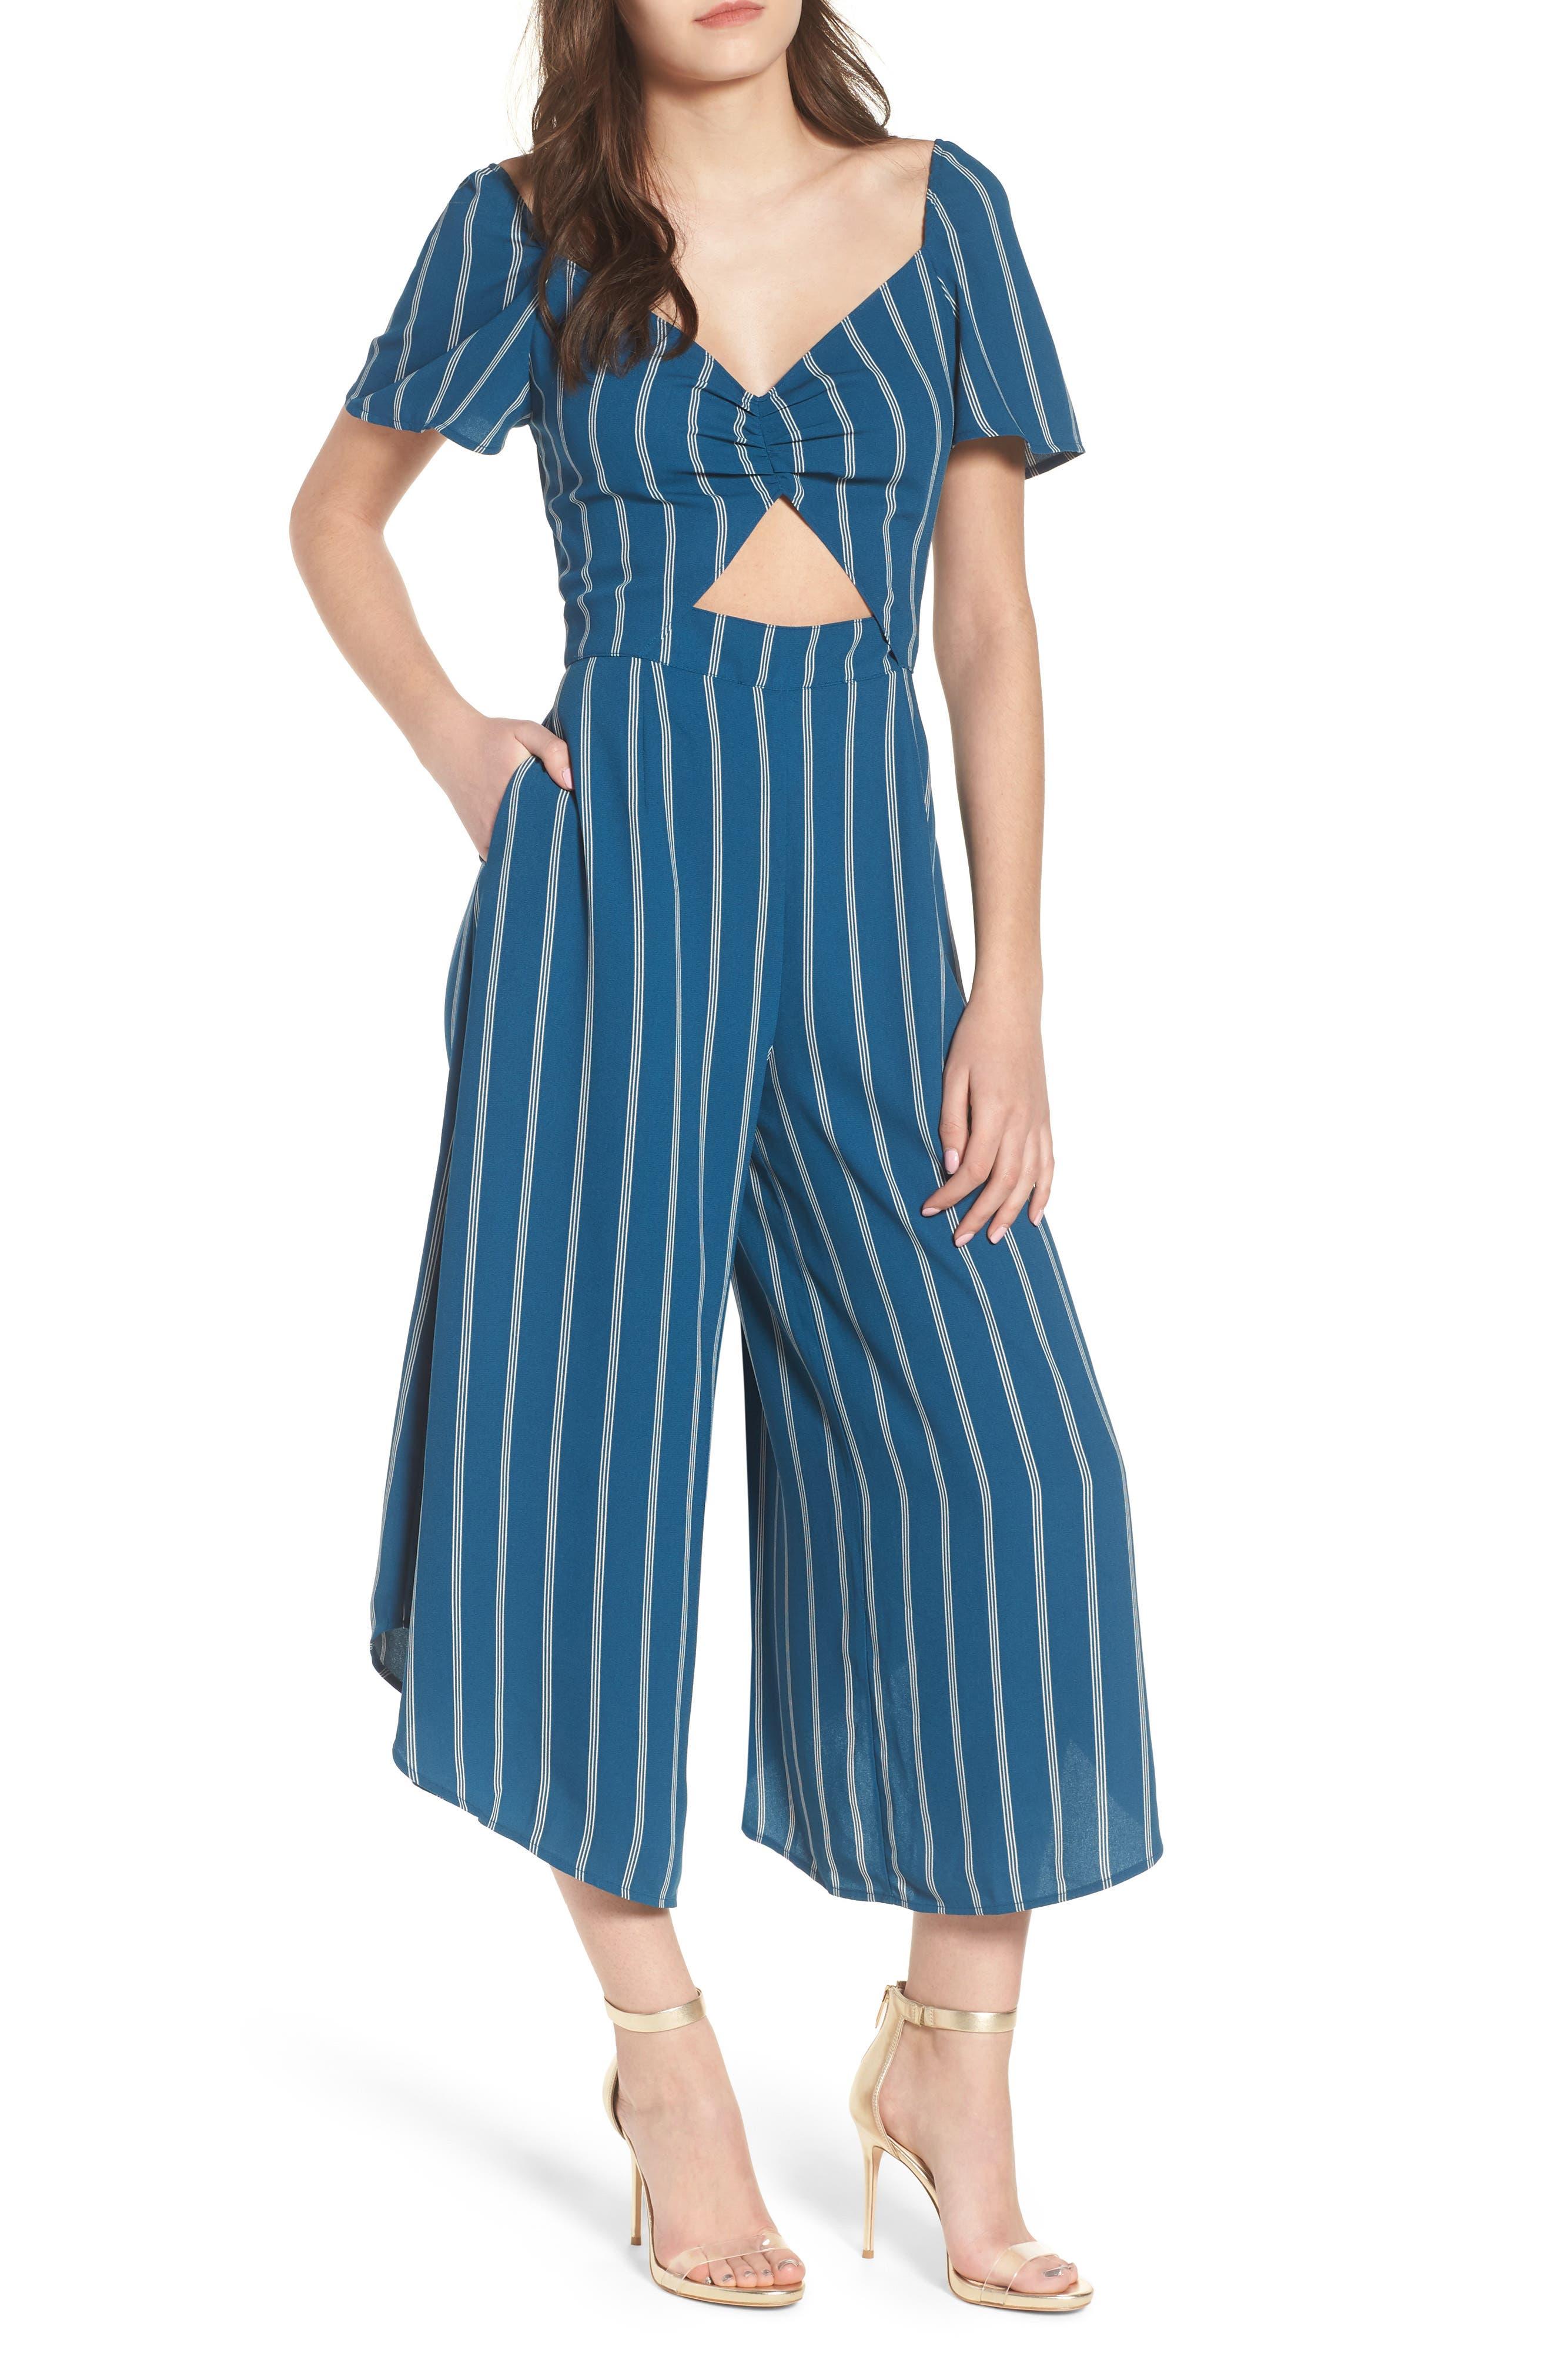 Cutout Culotte Jumpsuit,                             Main thumbnail 1, color,                             Teal Seagate Pinstripe